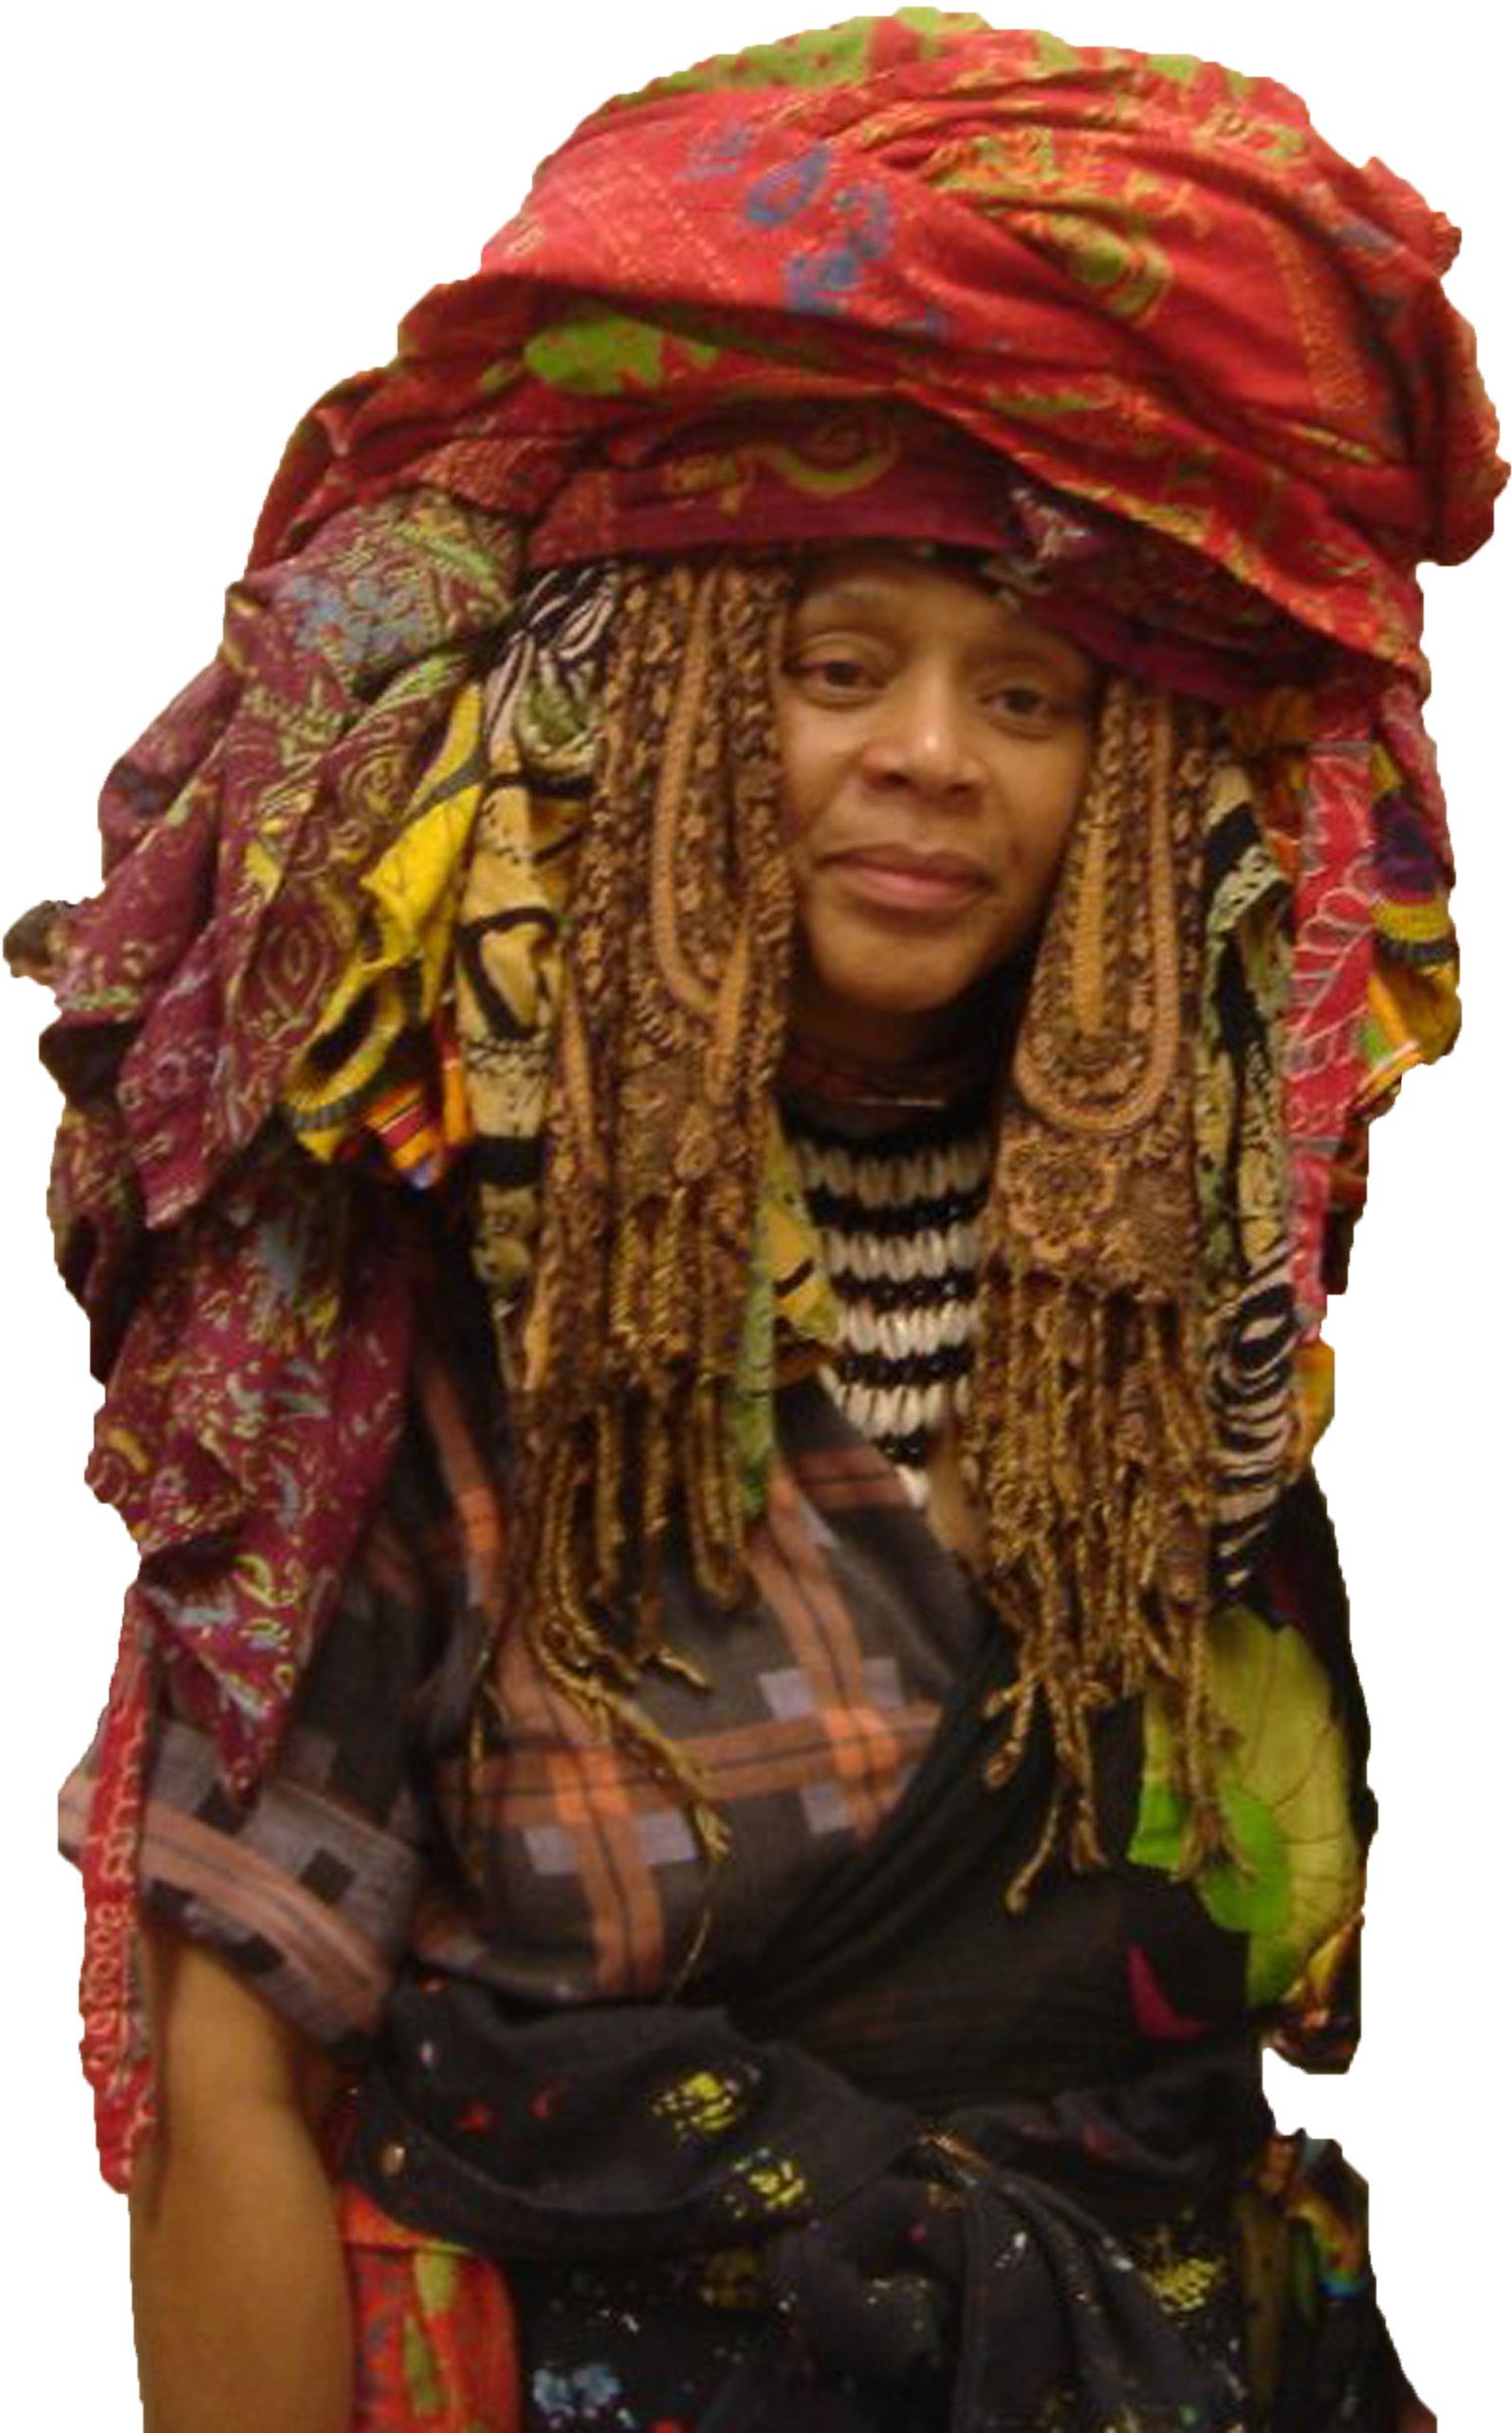 A person wearing an elaborate headdress